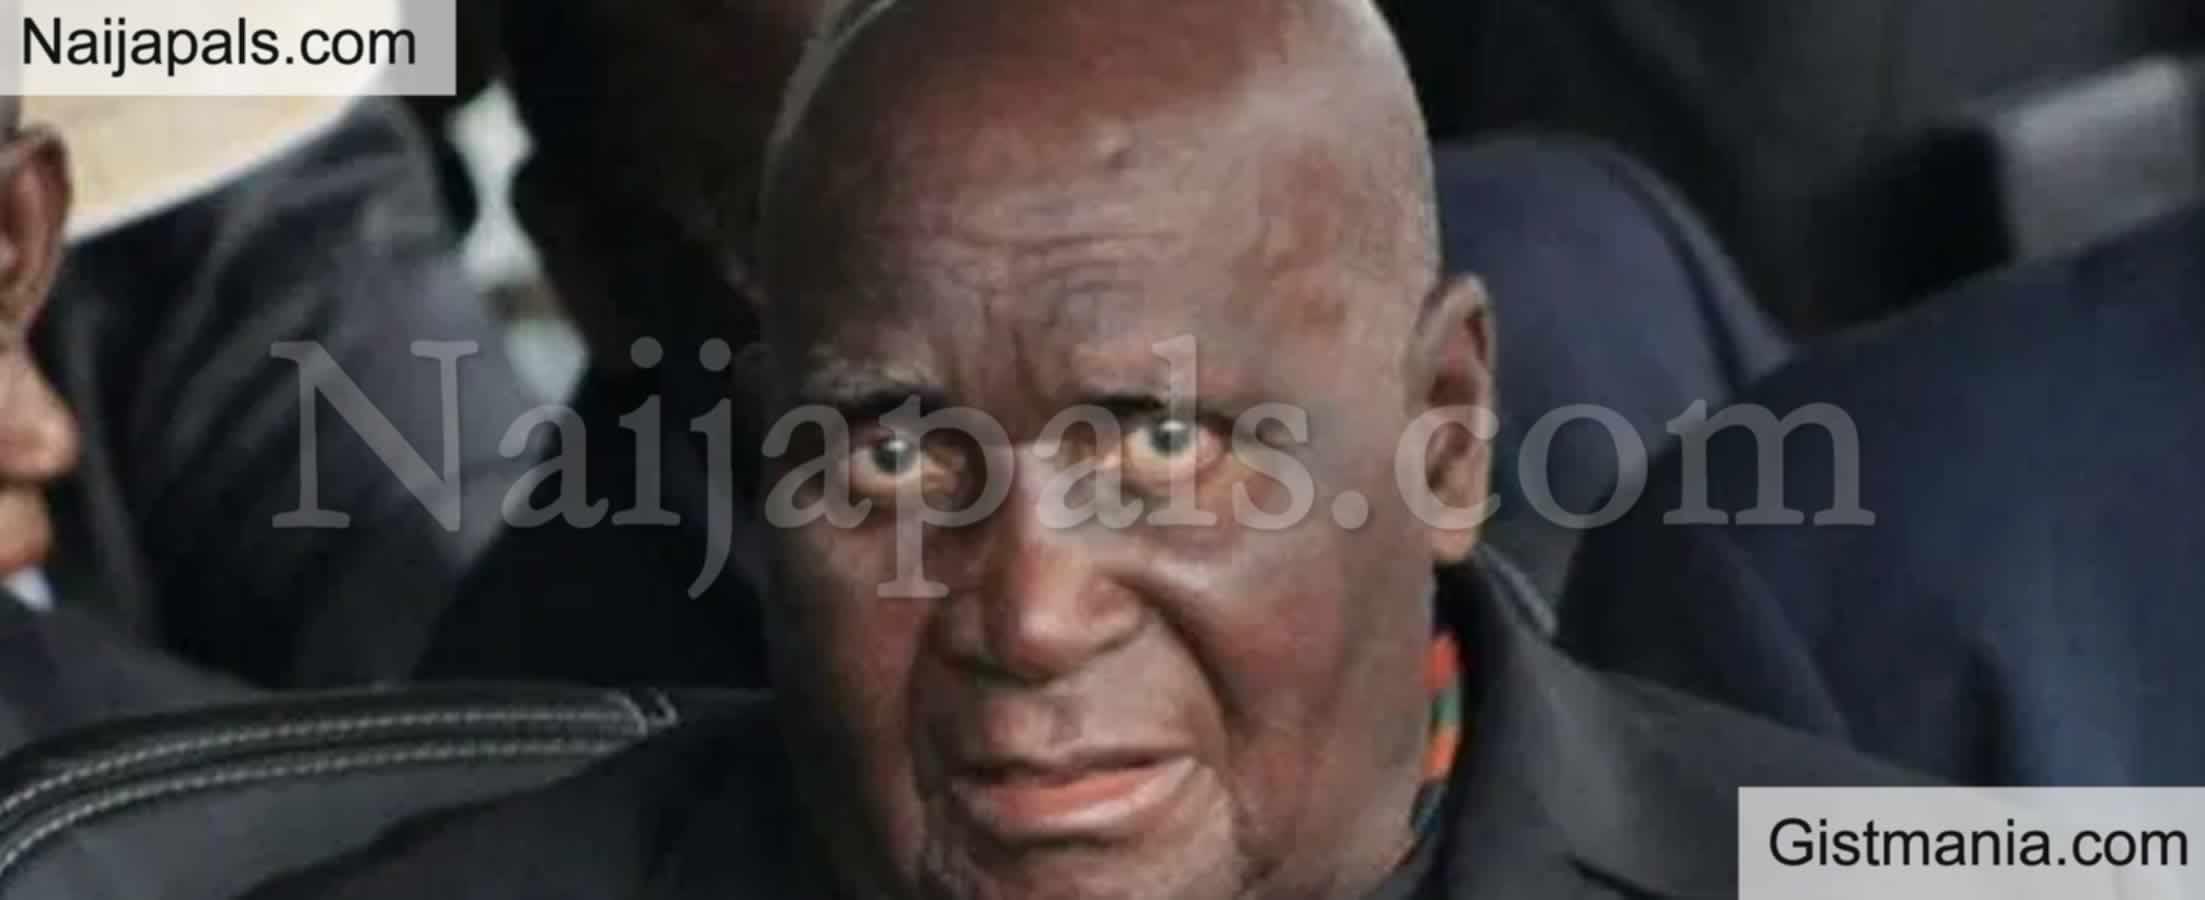 <img alt='.' class='lazyload' data-src='https://img.gistmania.com/emot/news.gif' /> <b>Story Of Zambia's Founding President, Kenneth Kaunda Who Was Not Ashamed To Weep In Public, Dies</b>